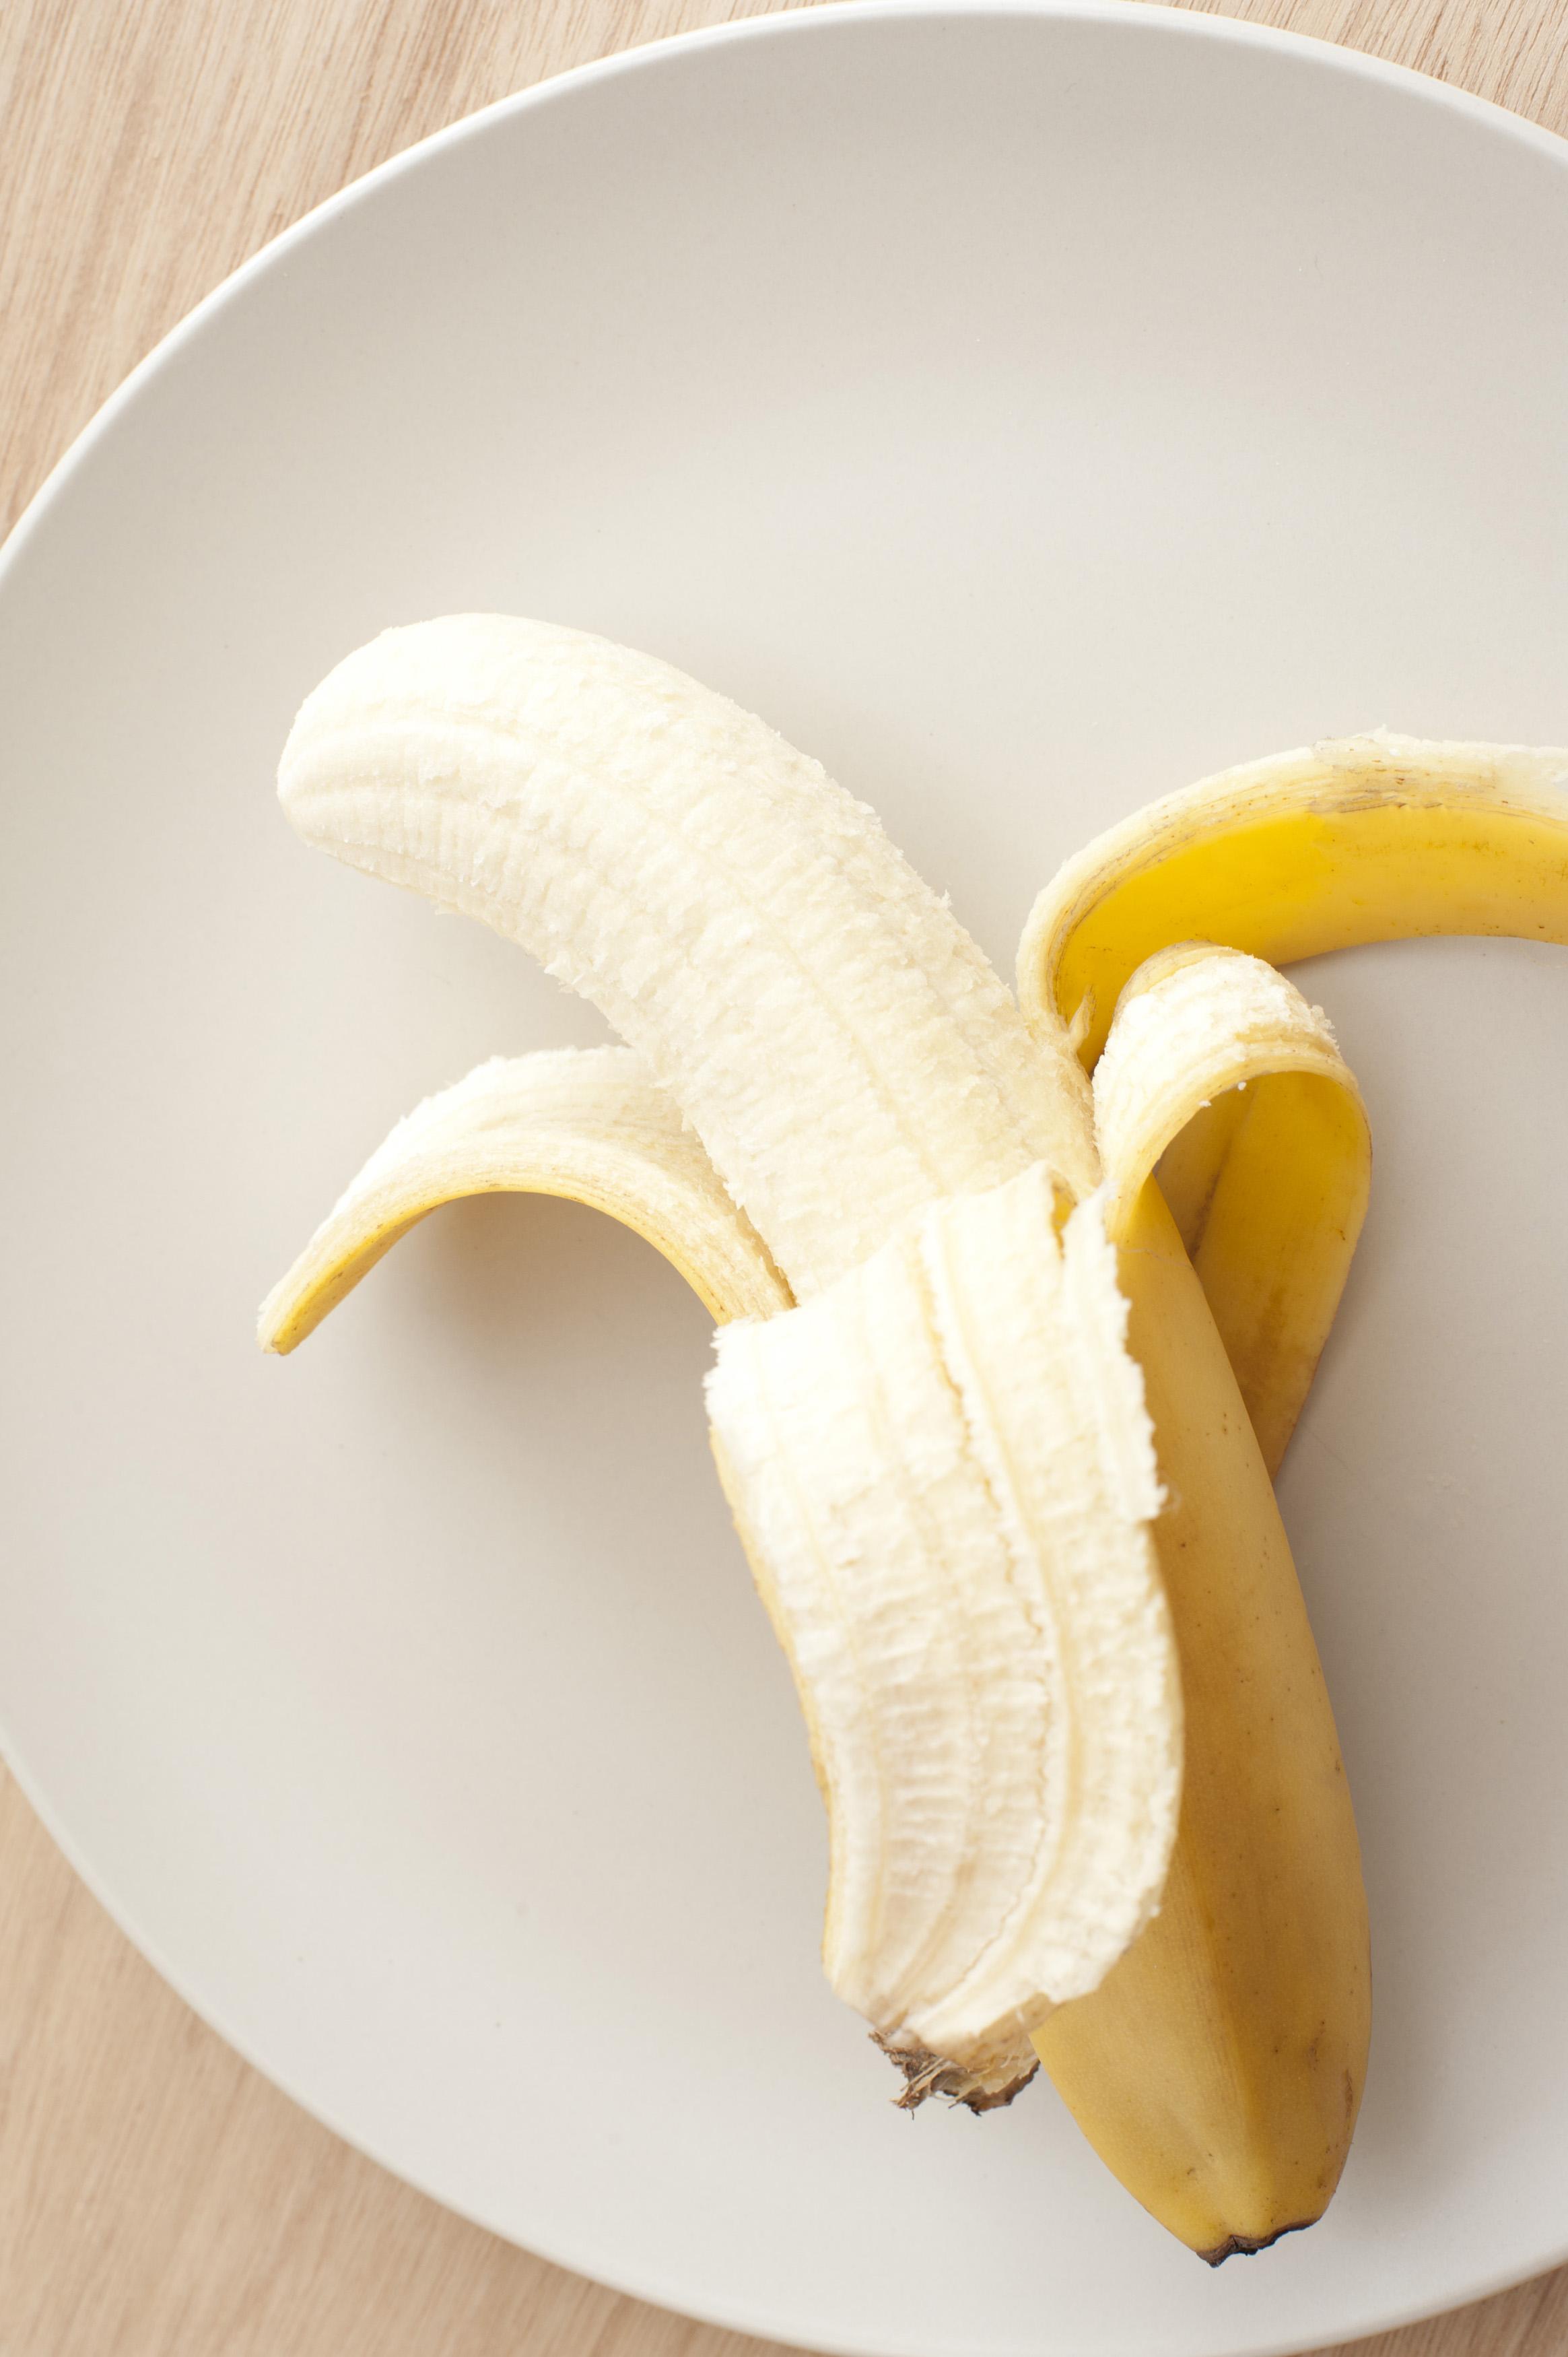 Peeled banana on a white plate - Free Stock Image